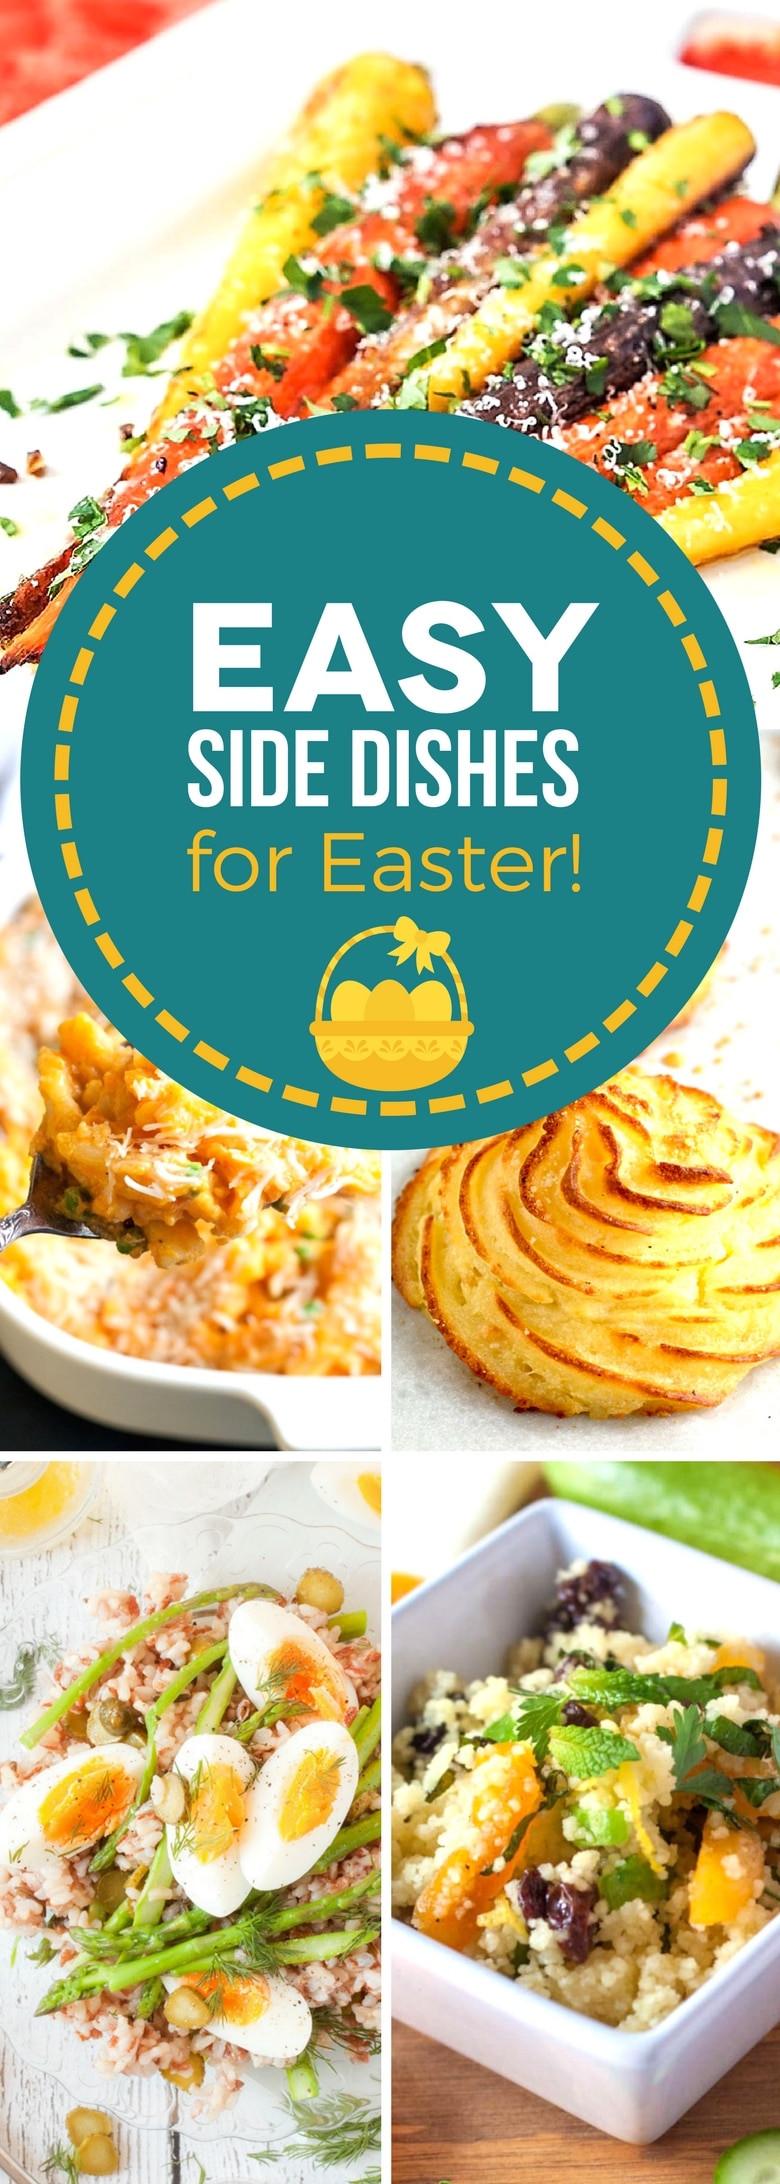 Easter Side Dishes Pinterest  Easy Easter Side Dishes SundaySupper